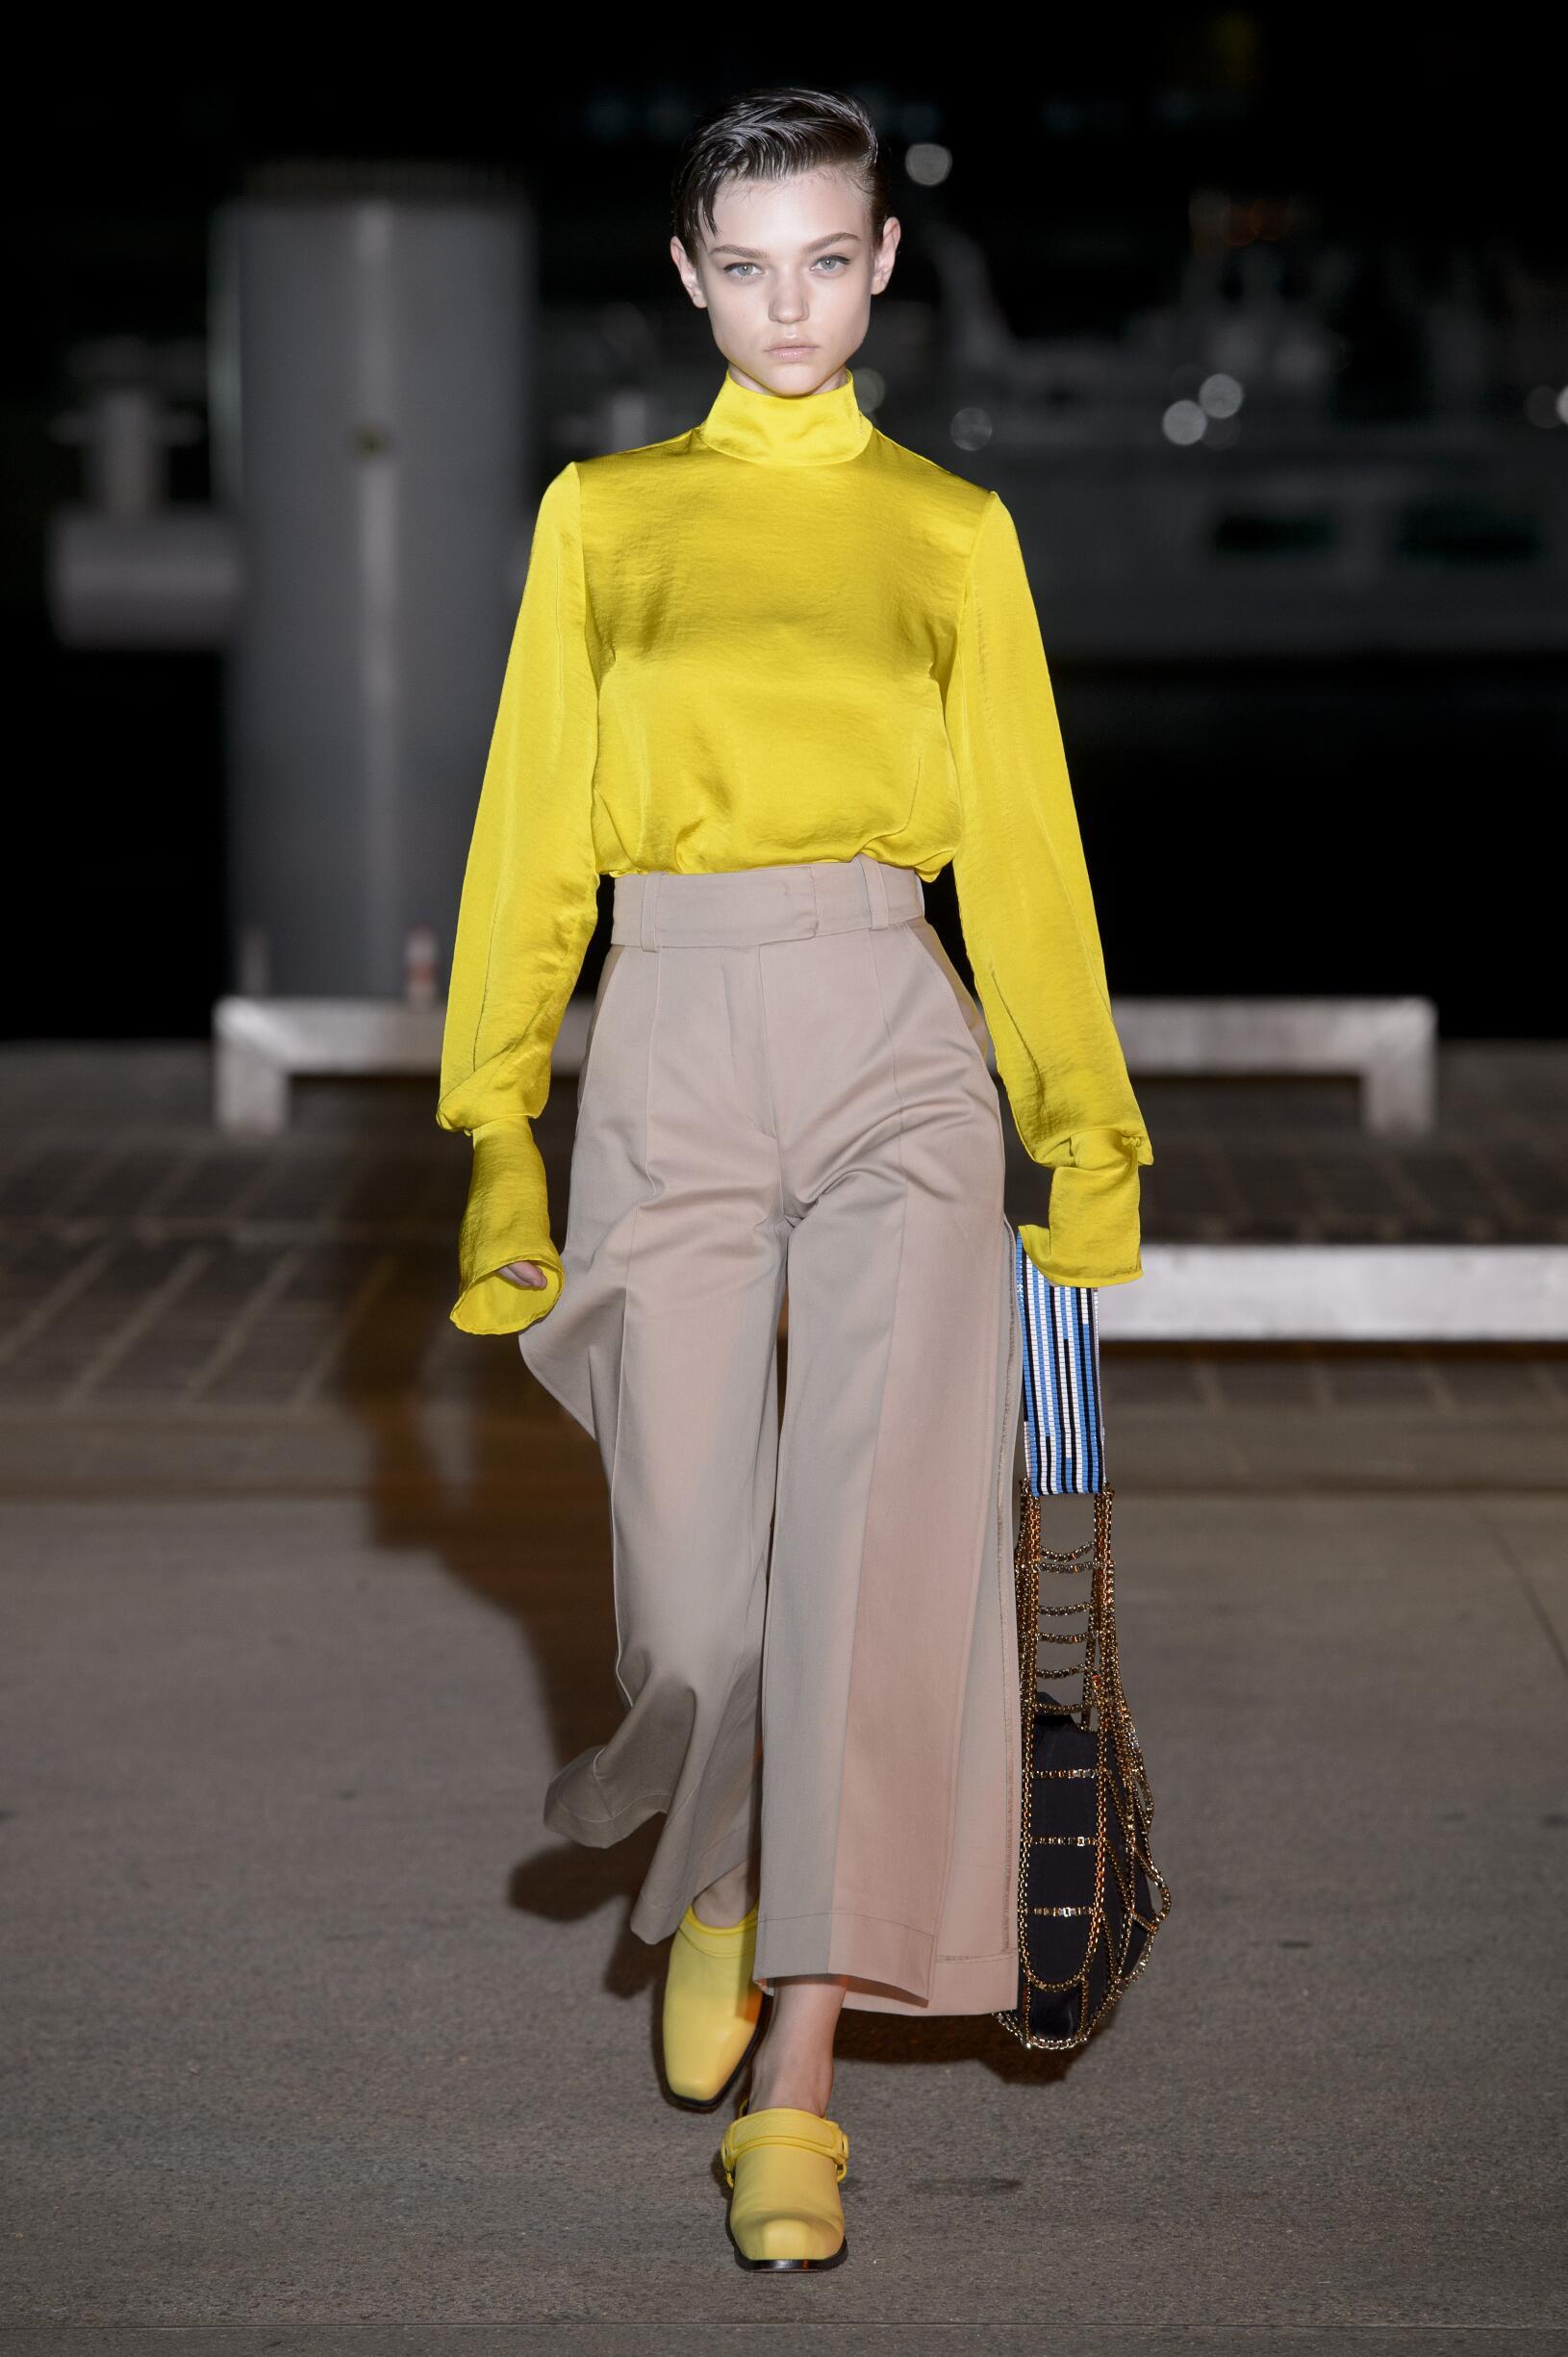 Wanda Nylon SS 2017 Womenswear